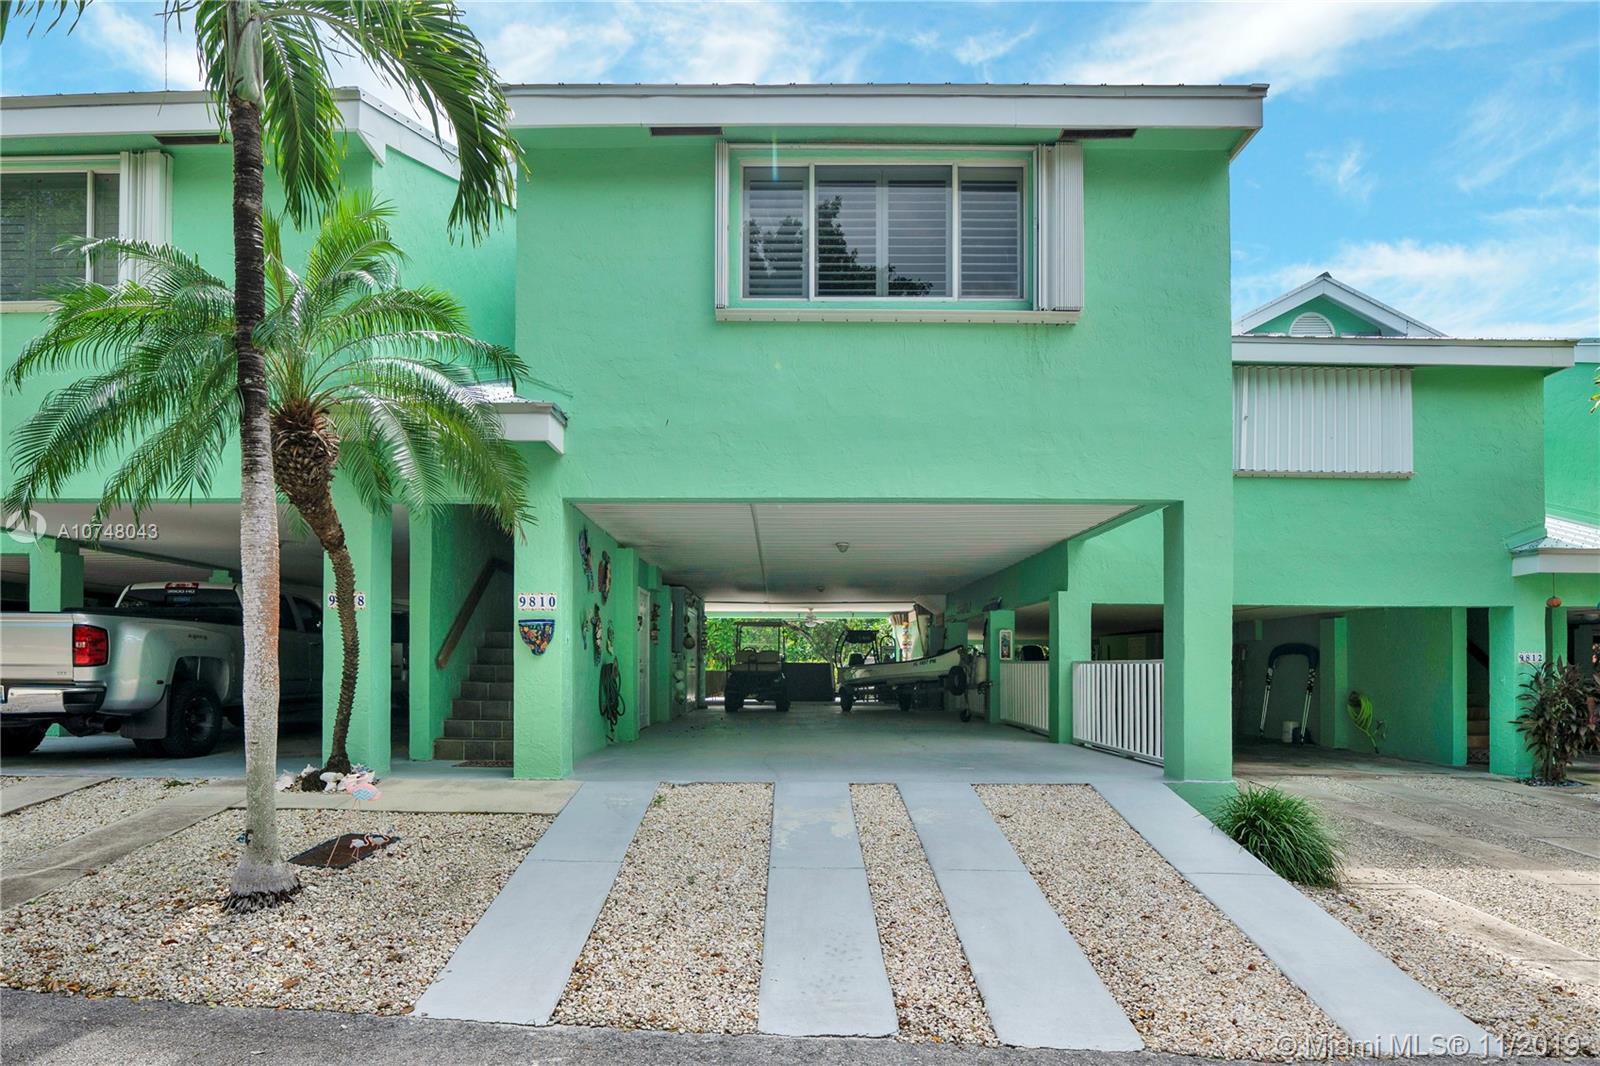 9810 Magellan #9810, Other City - Keys/Islands/Caribb, FL 33037 - Other City - Keys/Islands/Caribb, FL real estate listing